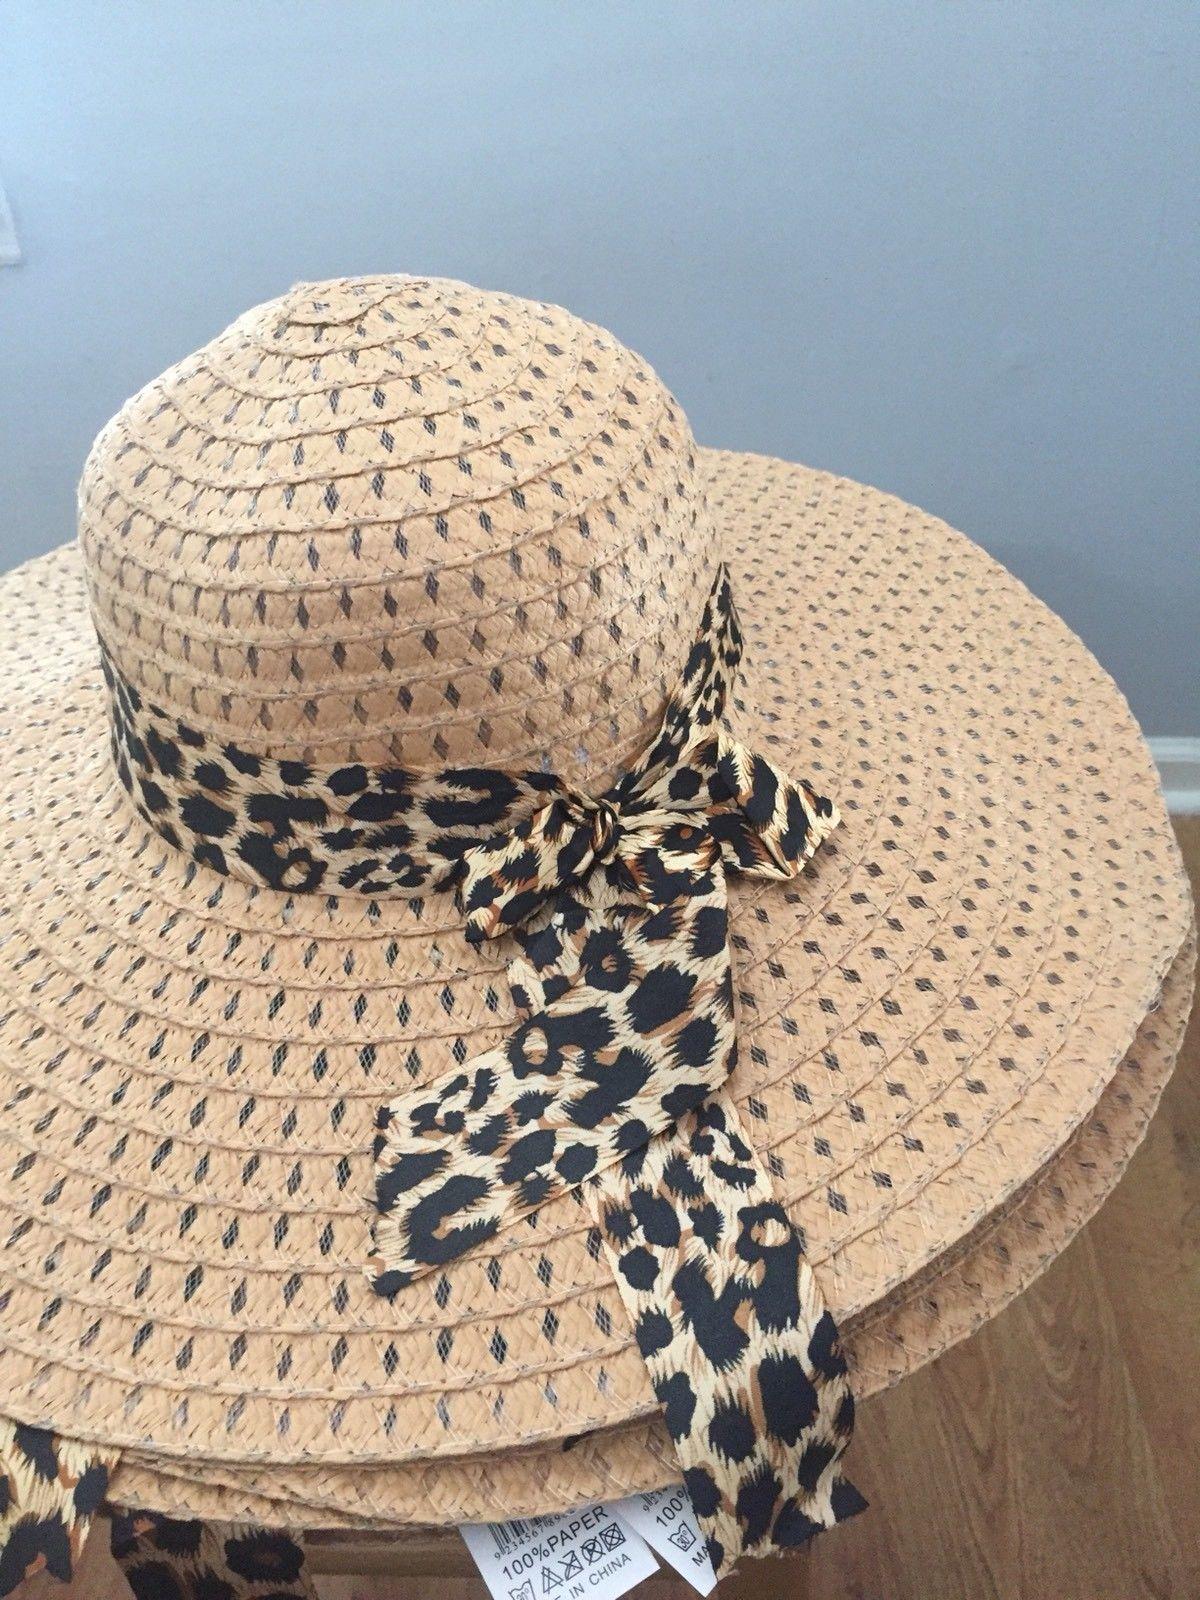 (DARK TAN) Sun-Floppy-Hat--Beach-Summer-Wide-Brim-With-Animal-Print-Ribbon